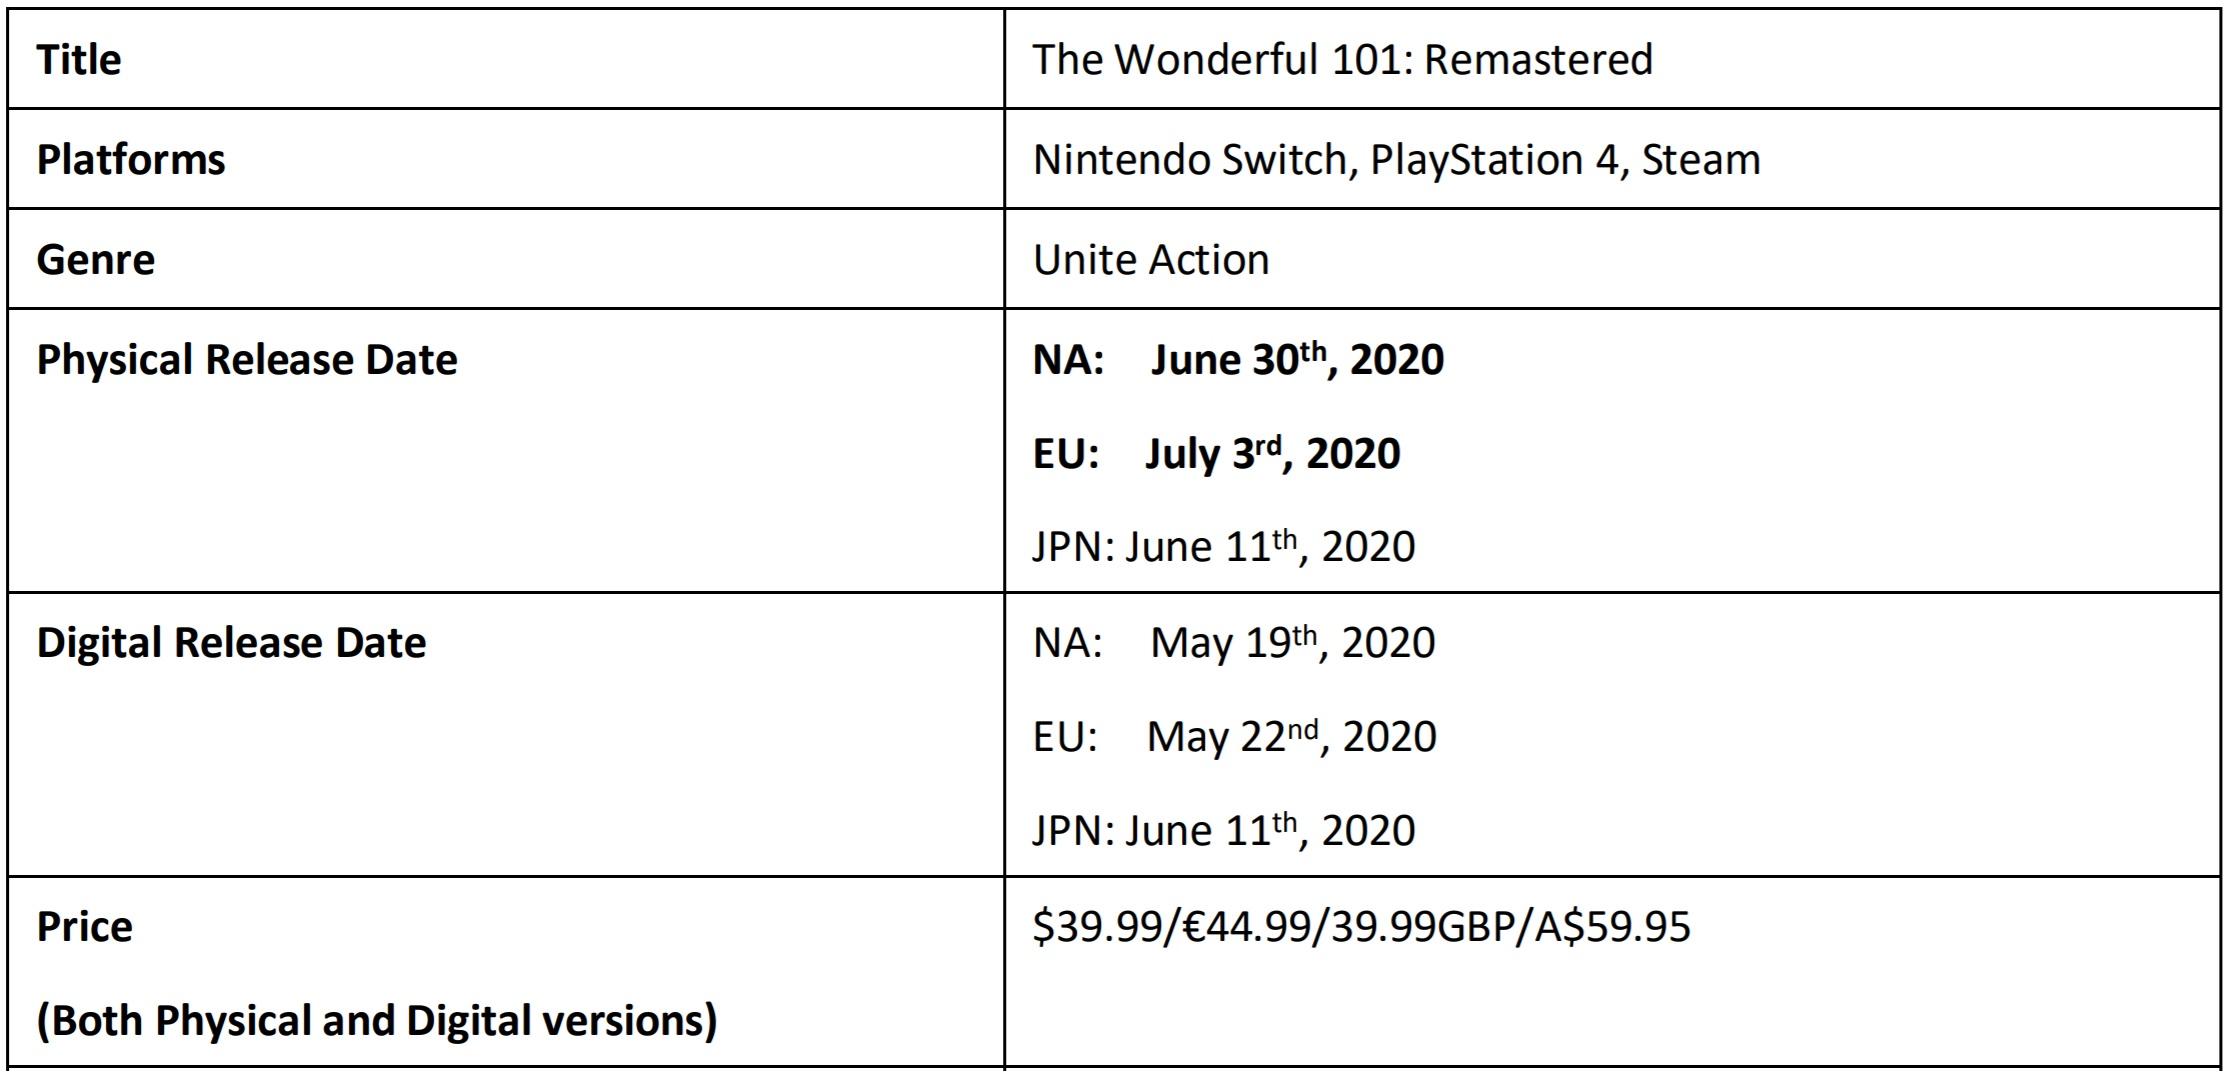 Wonderful 101 Release Update